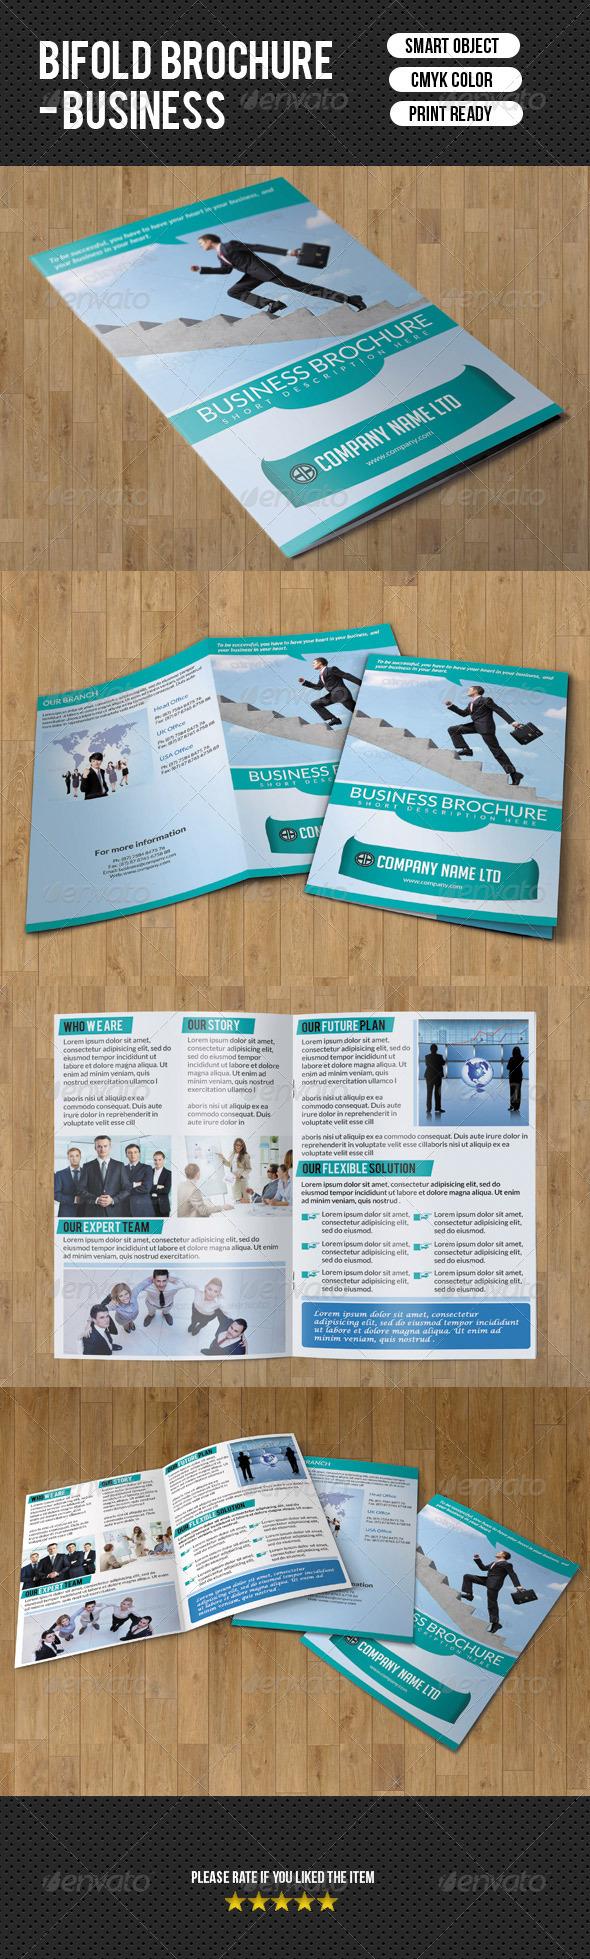 GraphicRiver Bifold Business Brochure 7389021